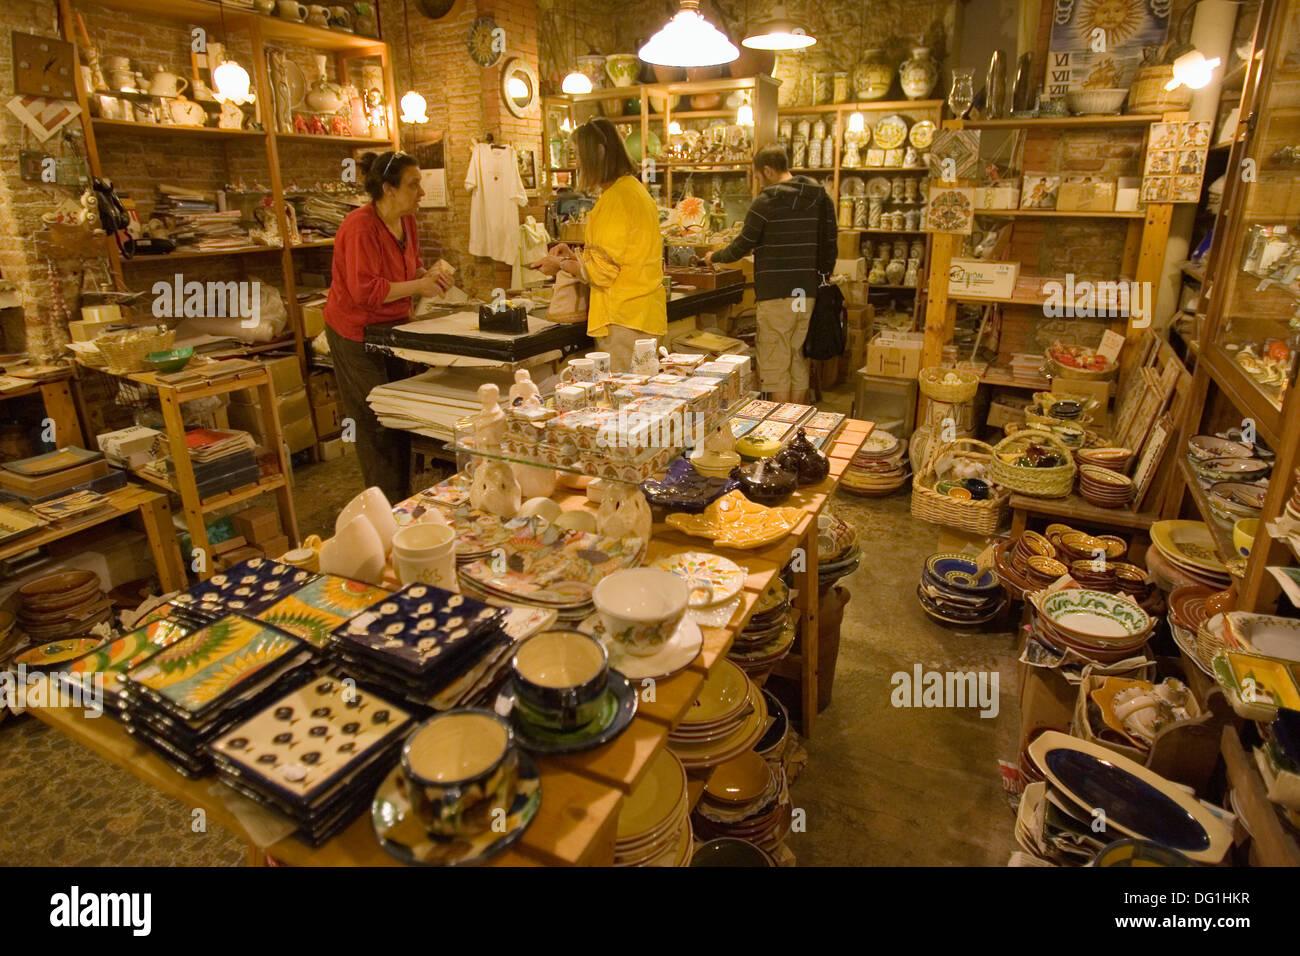 39 1748 39 tienda de artesan a cer mica carrer montcada - Artesania barcelona ...